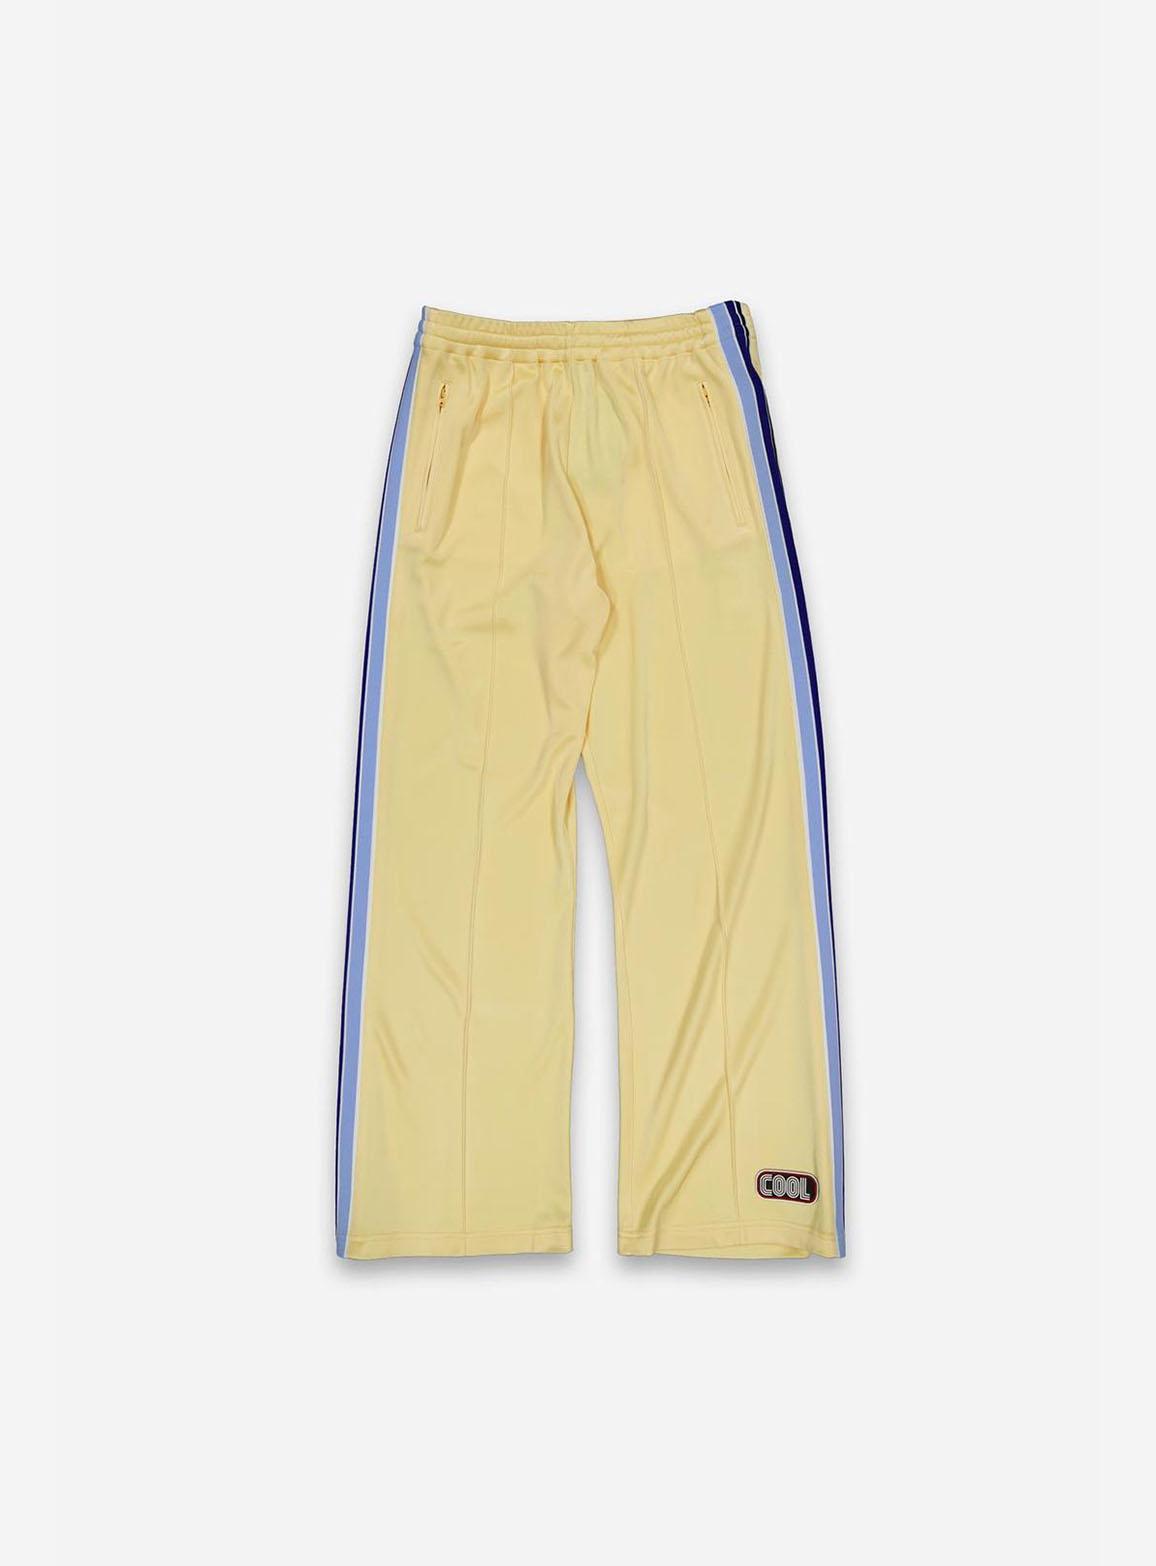 Yellow tracksuit pants